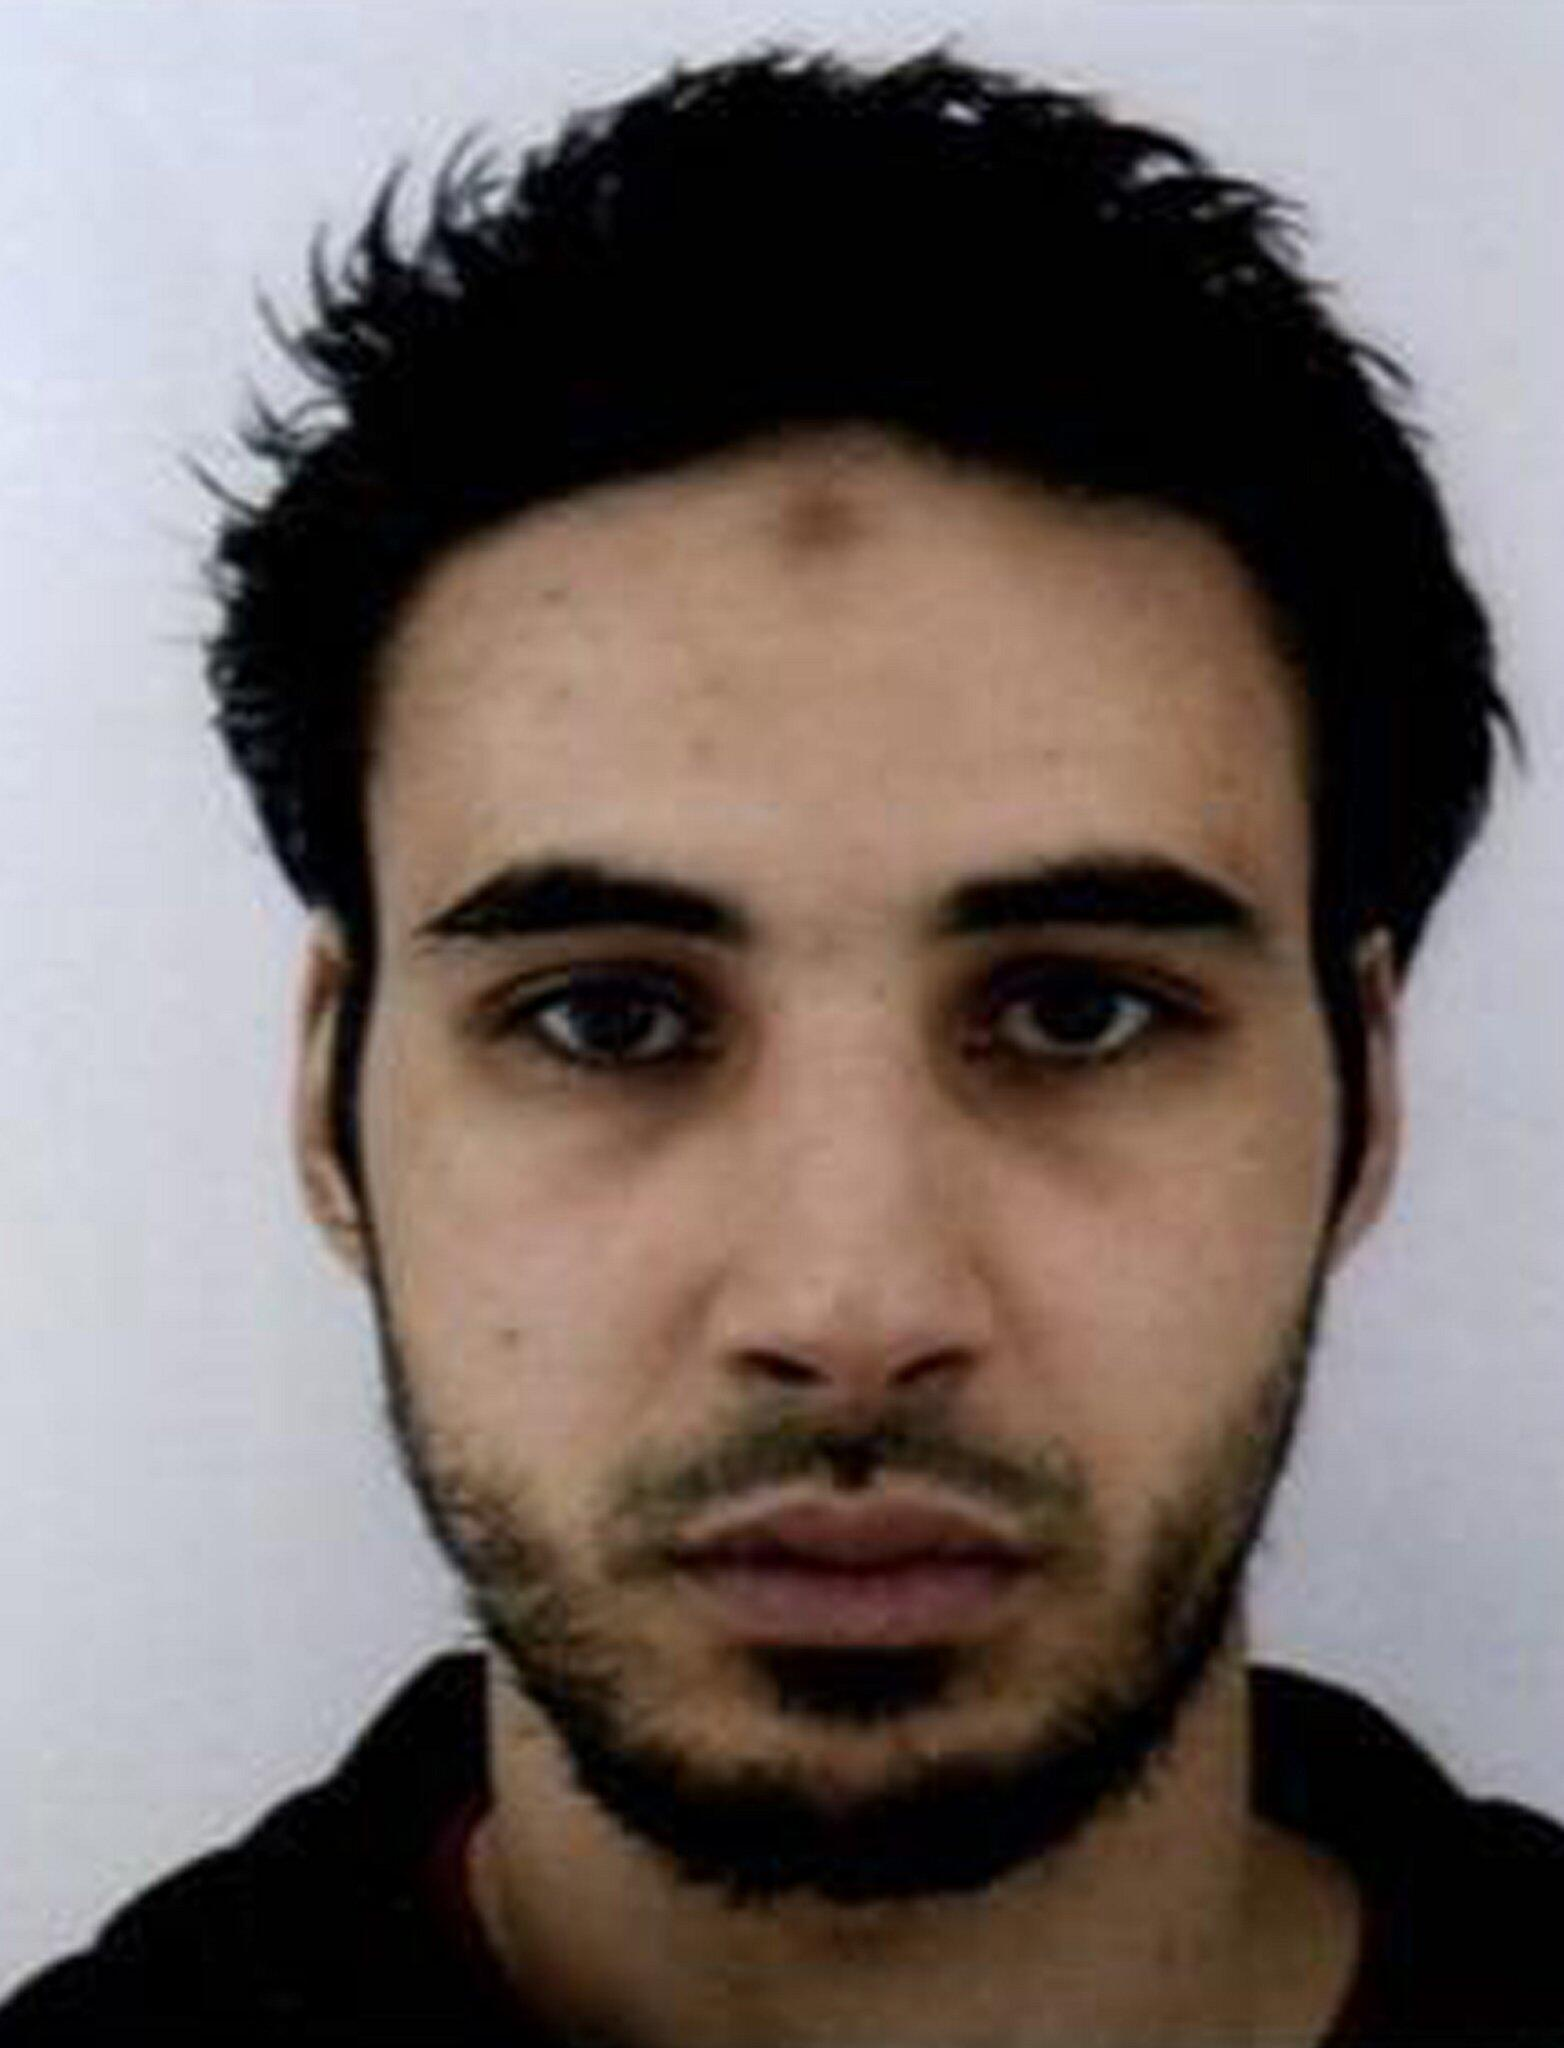 Bild zu Tatverdächtiger des Straßburger Attentats